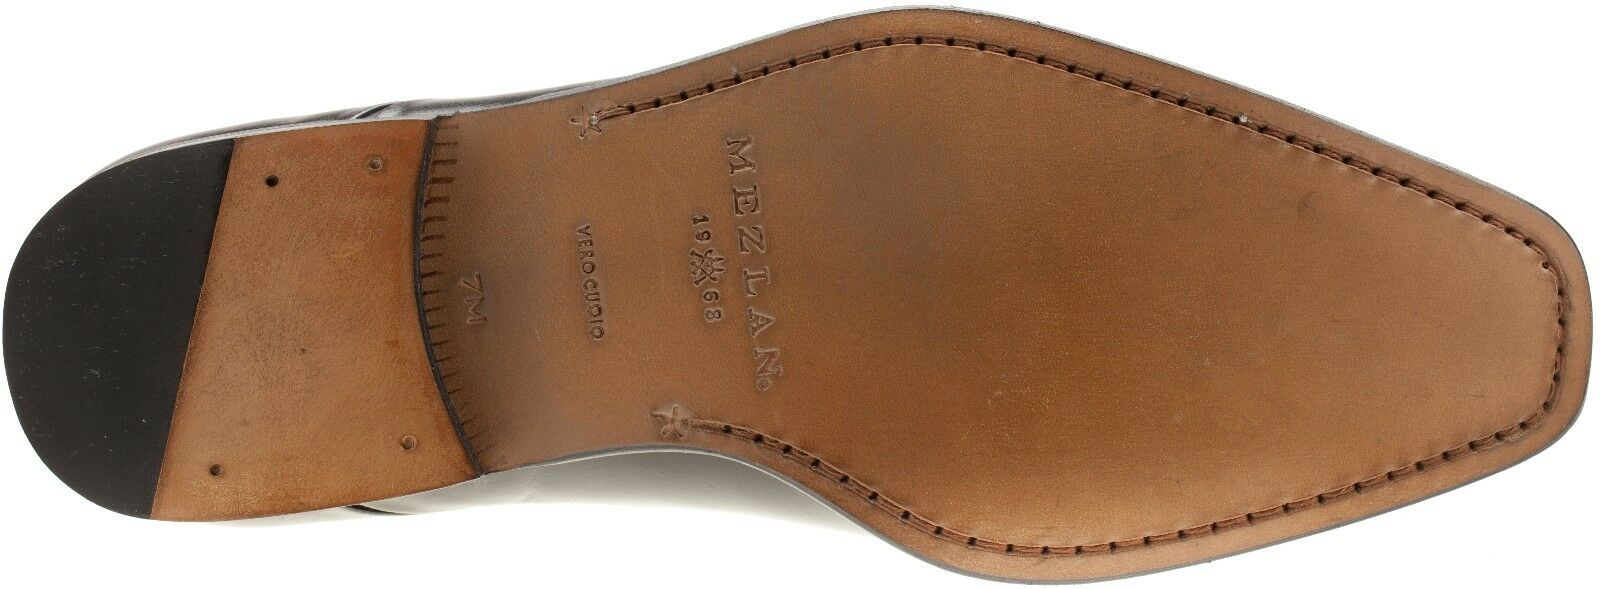 Mezlan Herren Herren Herren 15671 Schwarzes Leder Kappe Zeh Oxford Formelle Schuhe 58a58f